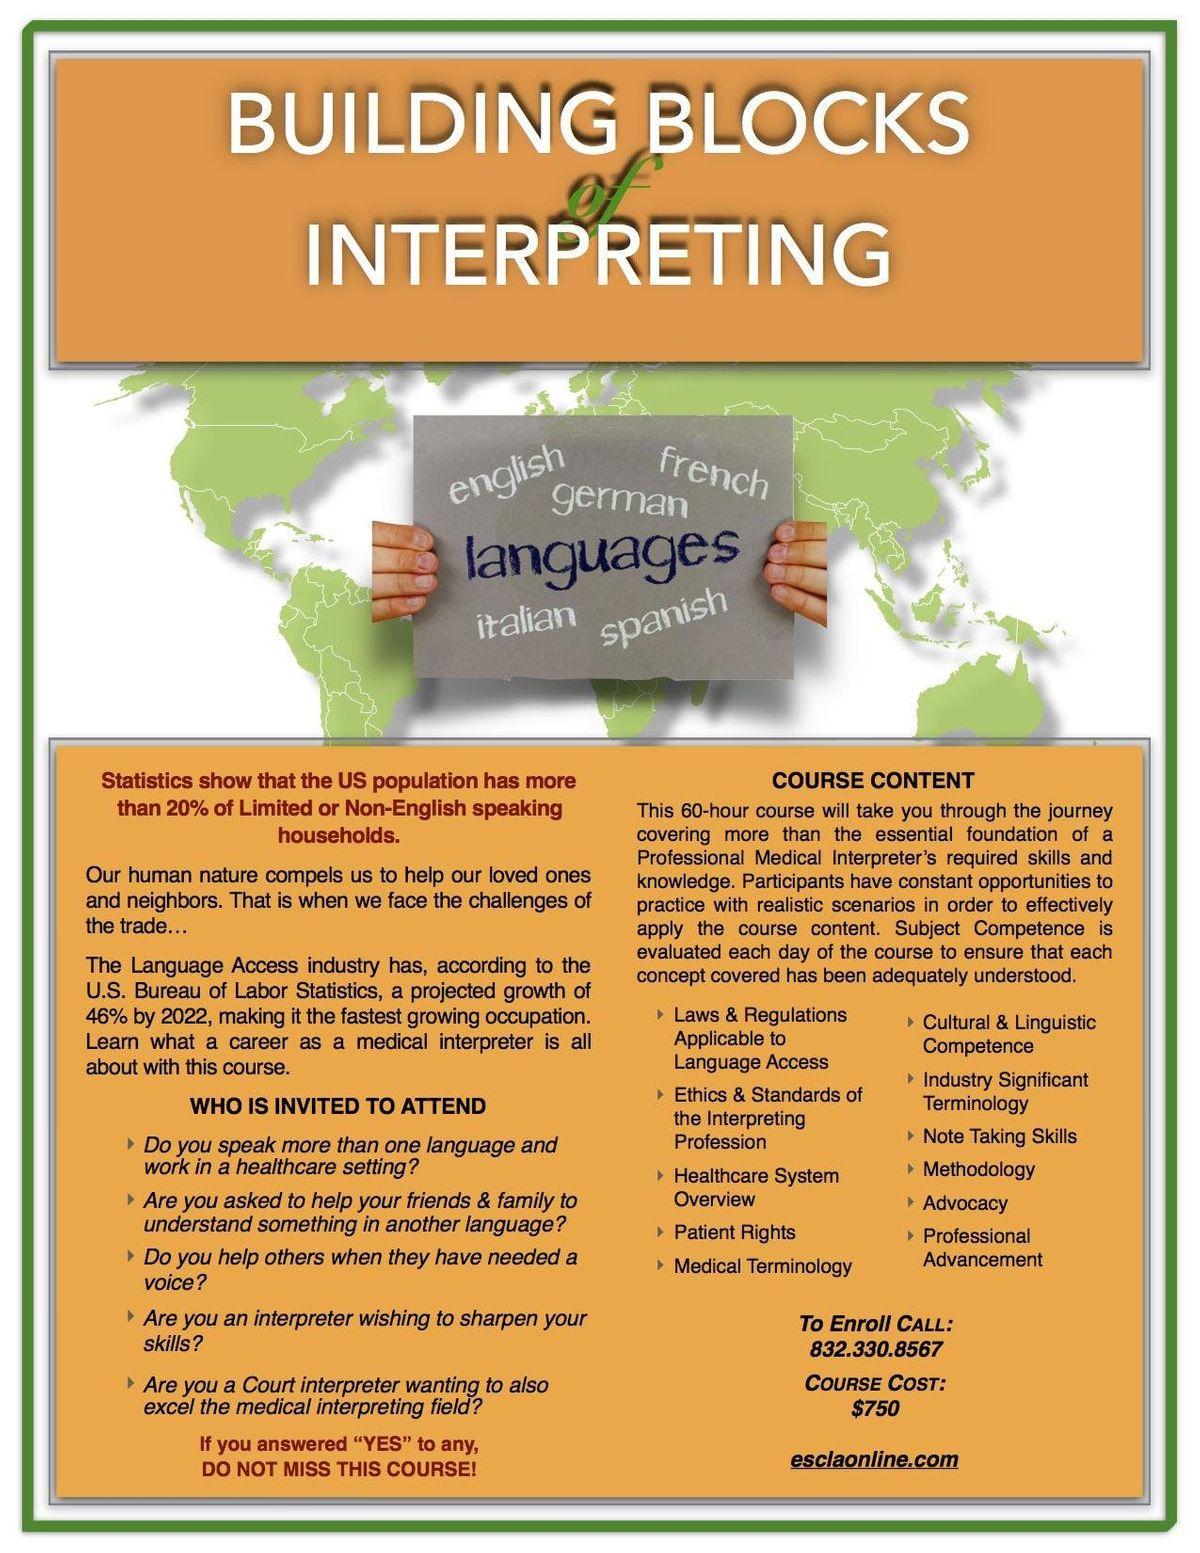 Building Blocks of Interpreting - Intensive 60-Hour Medical Program